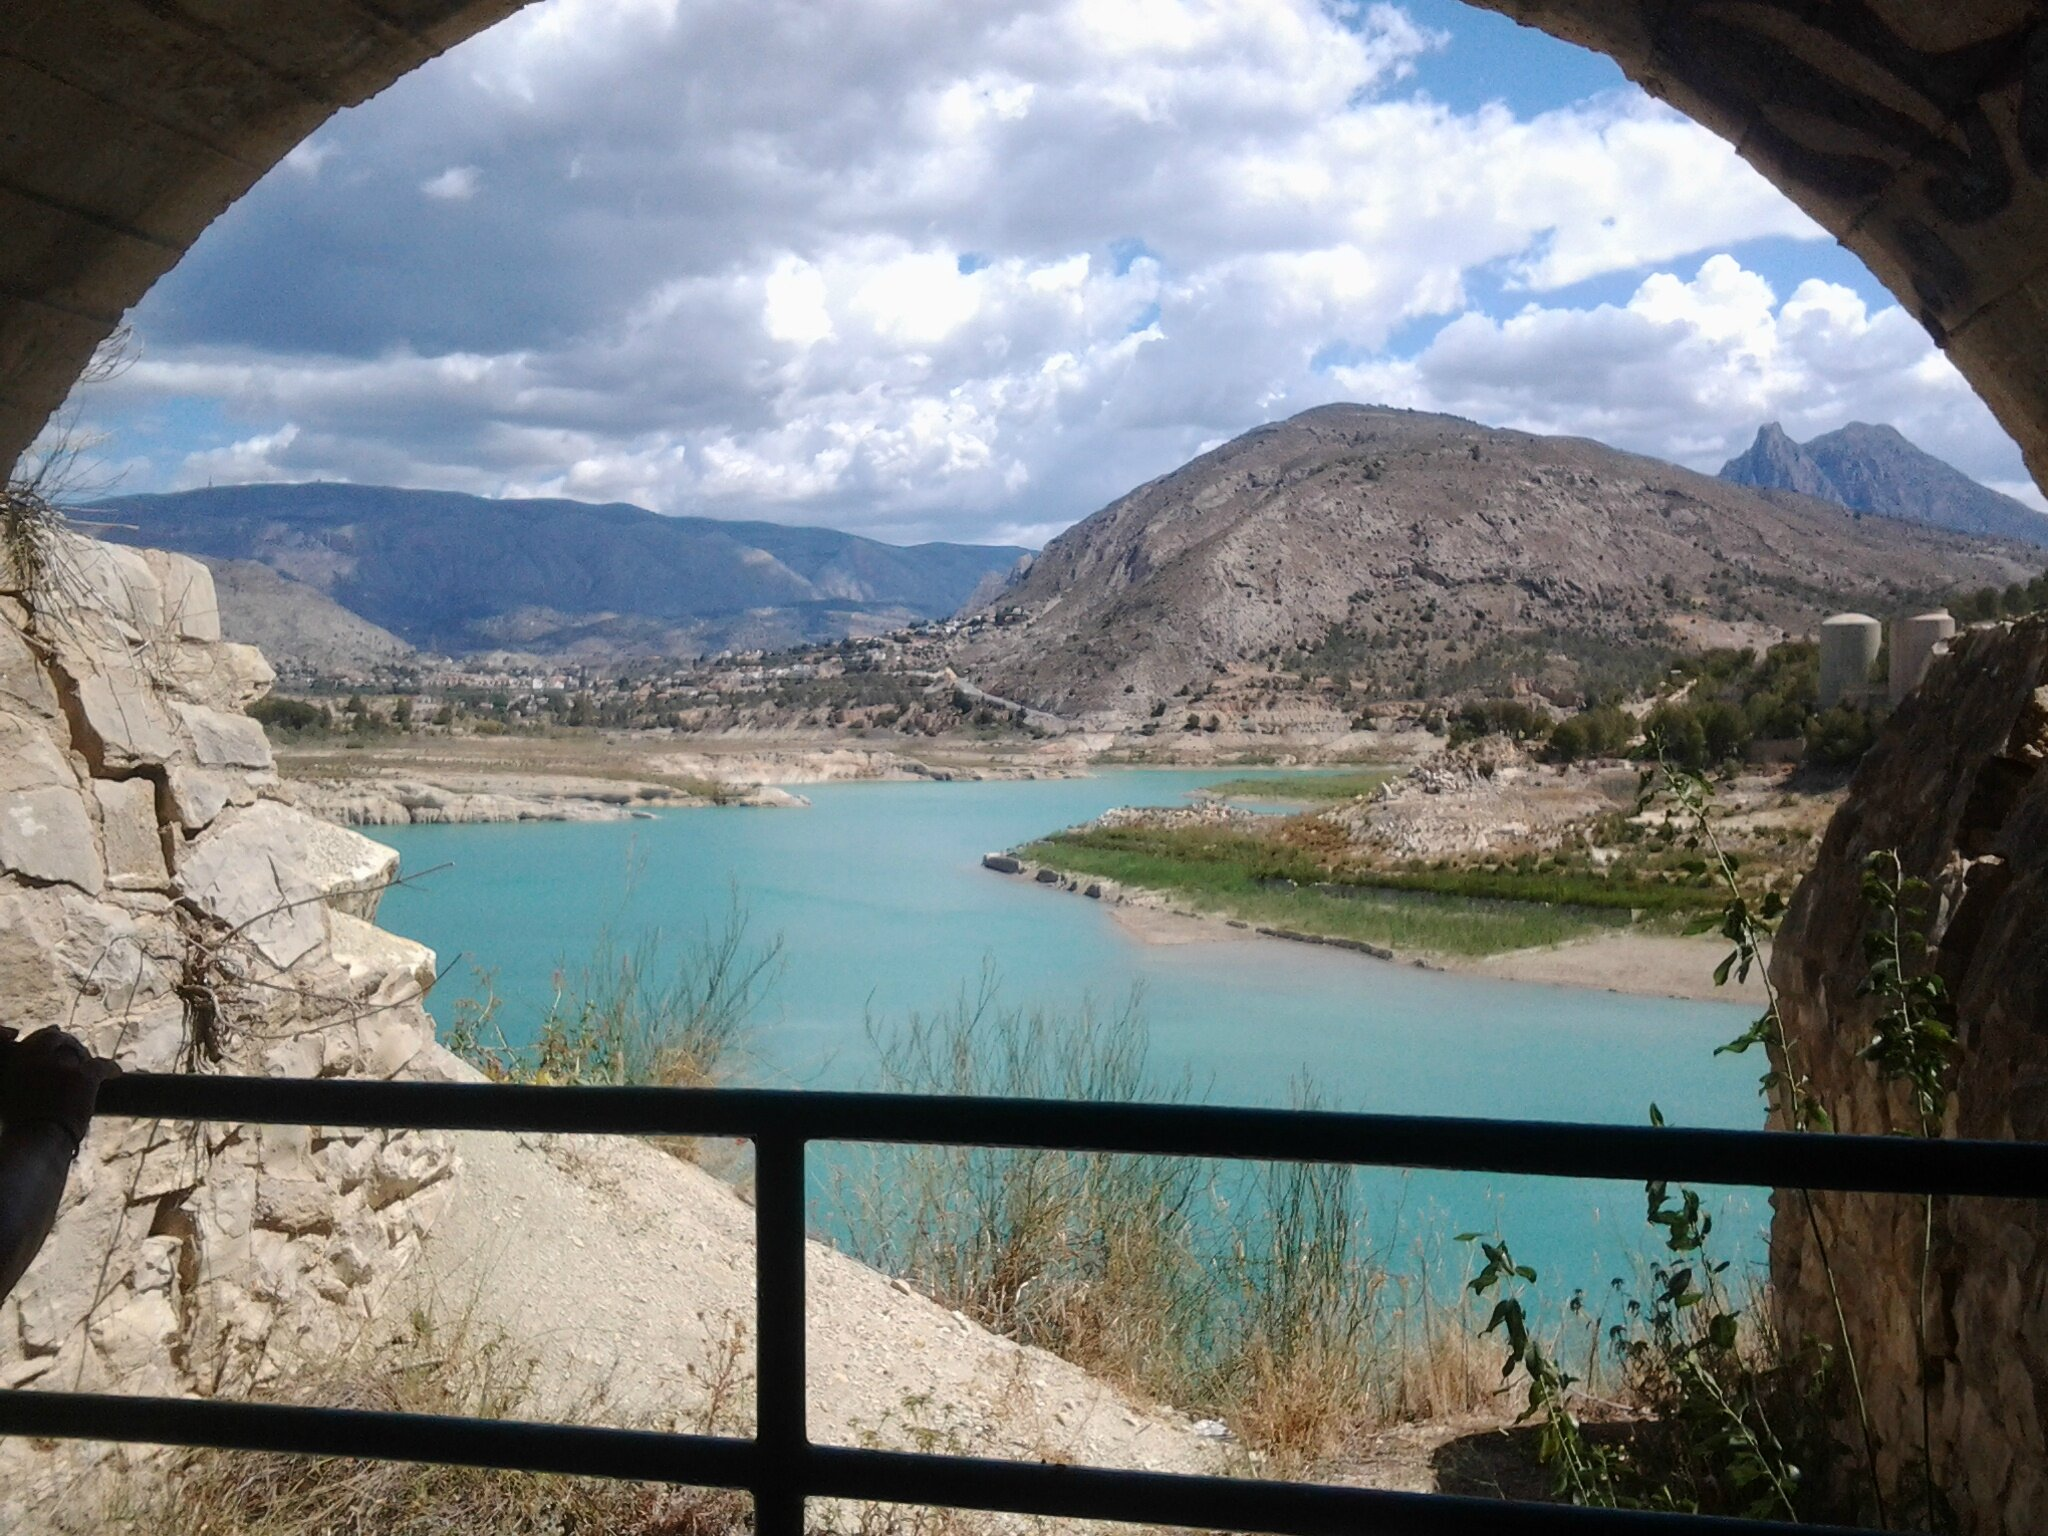 Balade au barrage de l'Amadoiro